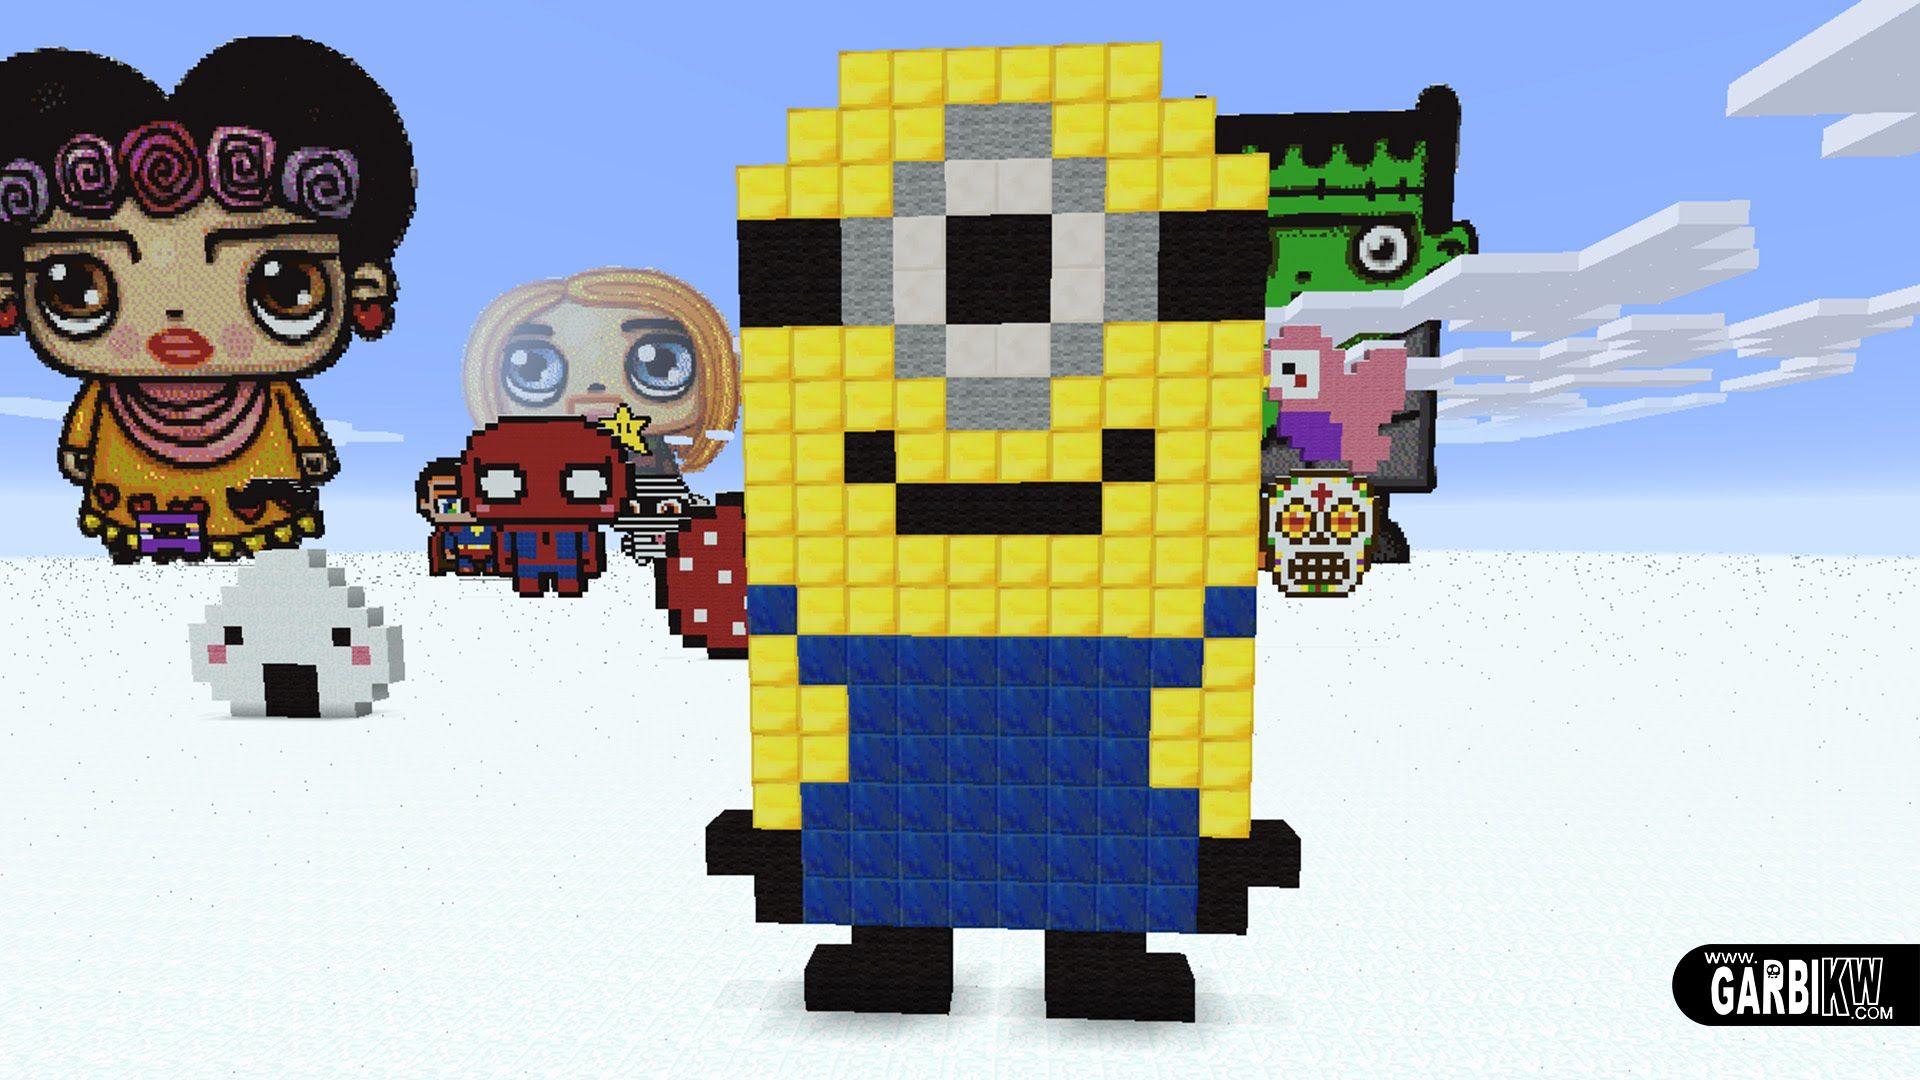 Minecraft Pixel Art How To Make A Minion ¢ートのアイデア Ôクセルアート ¢ート